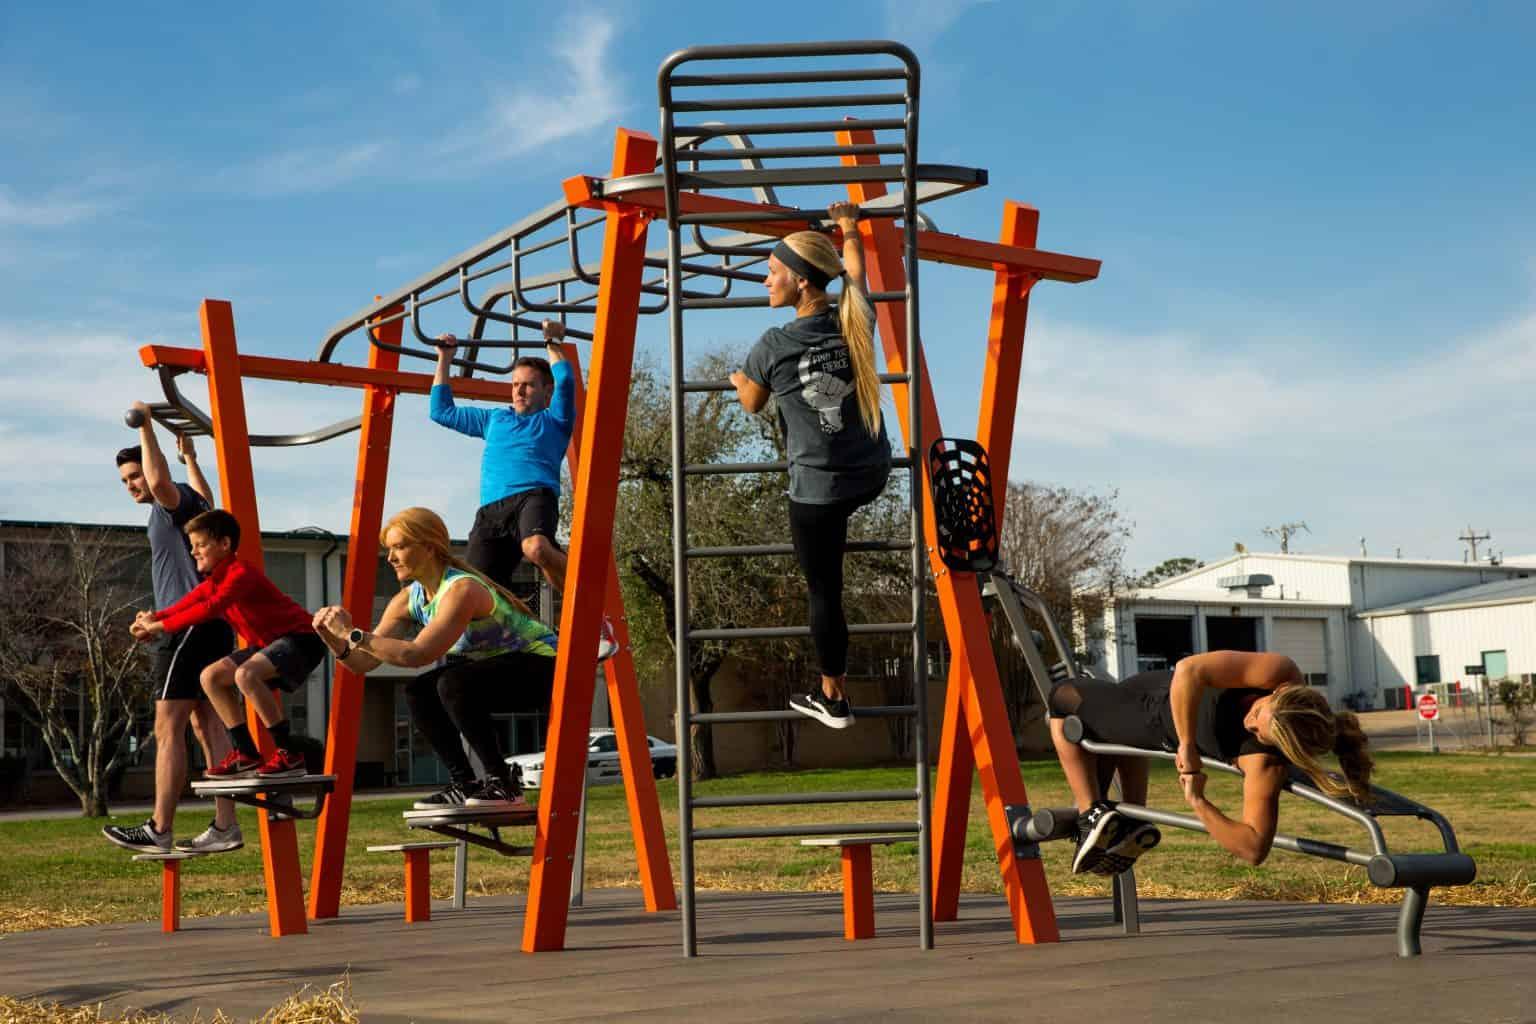 outdoor-fitness-equipment_49644069152_o-1536x1024